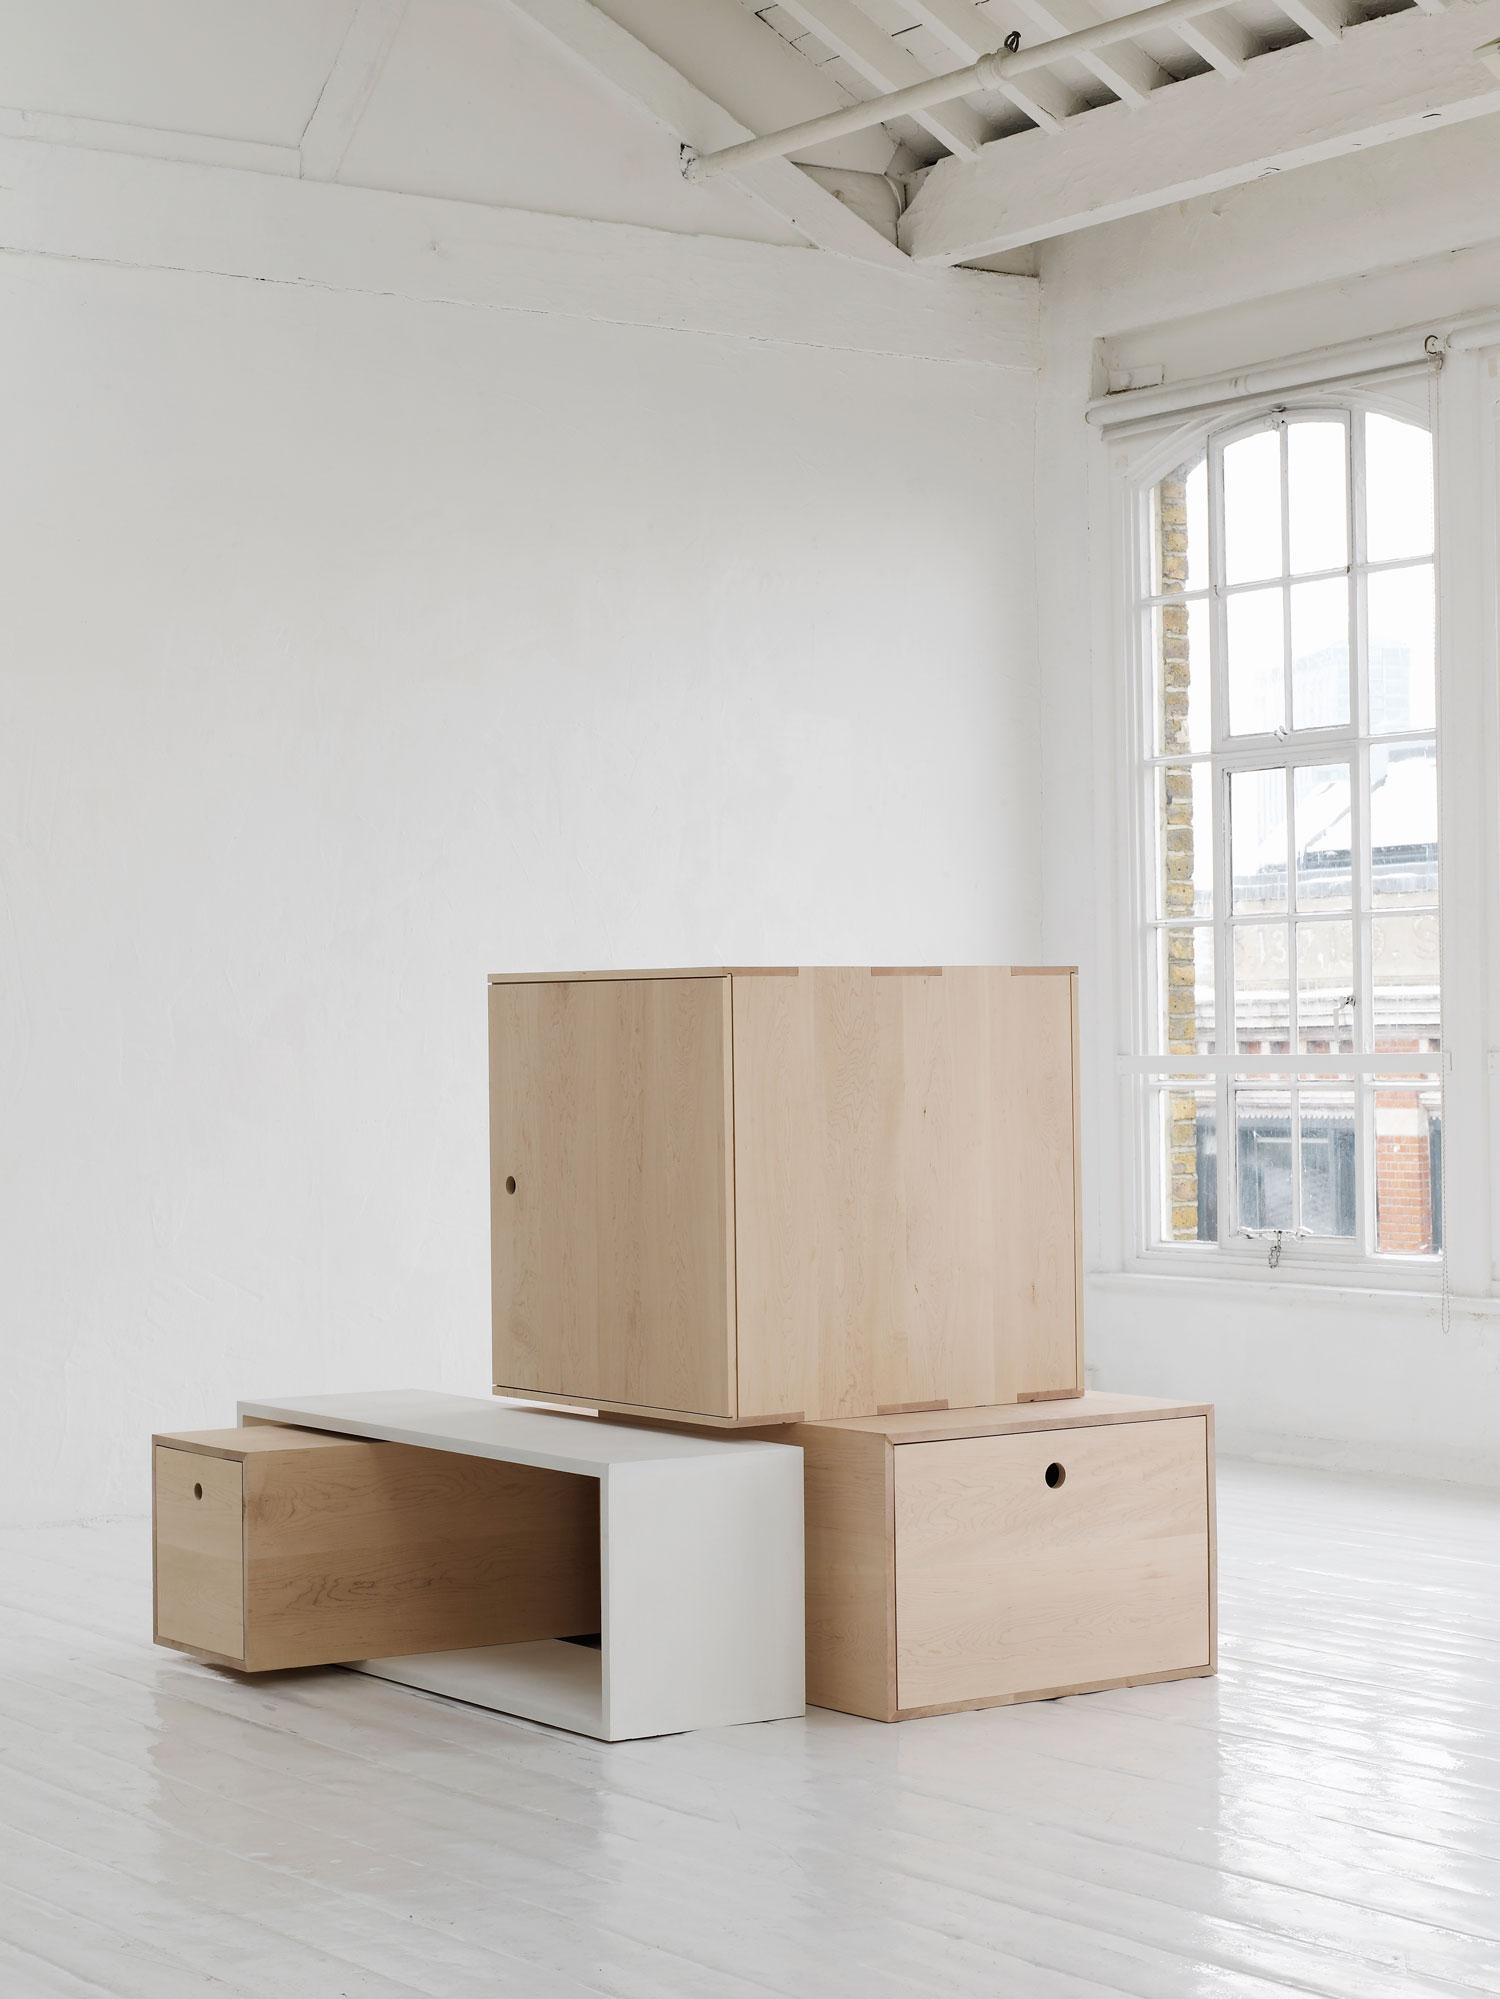 11 Boxes by Studio Vit   Yellowtrace